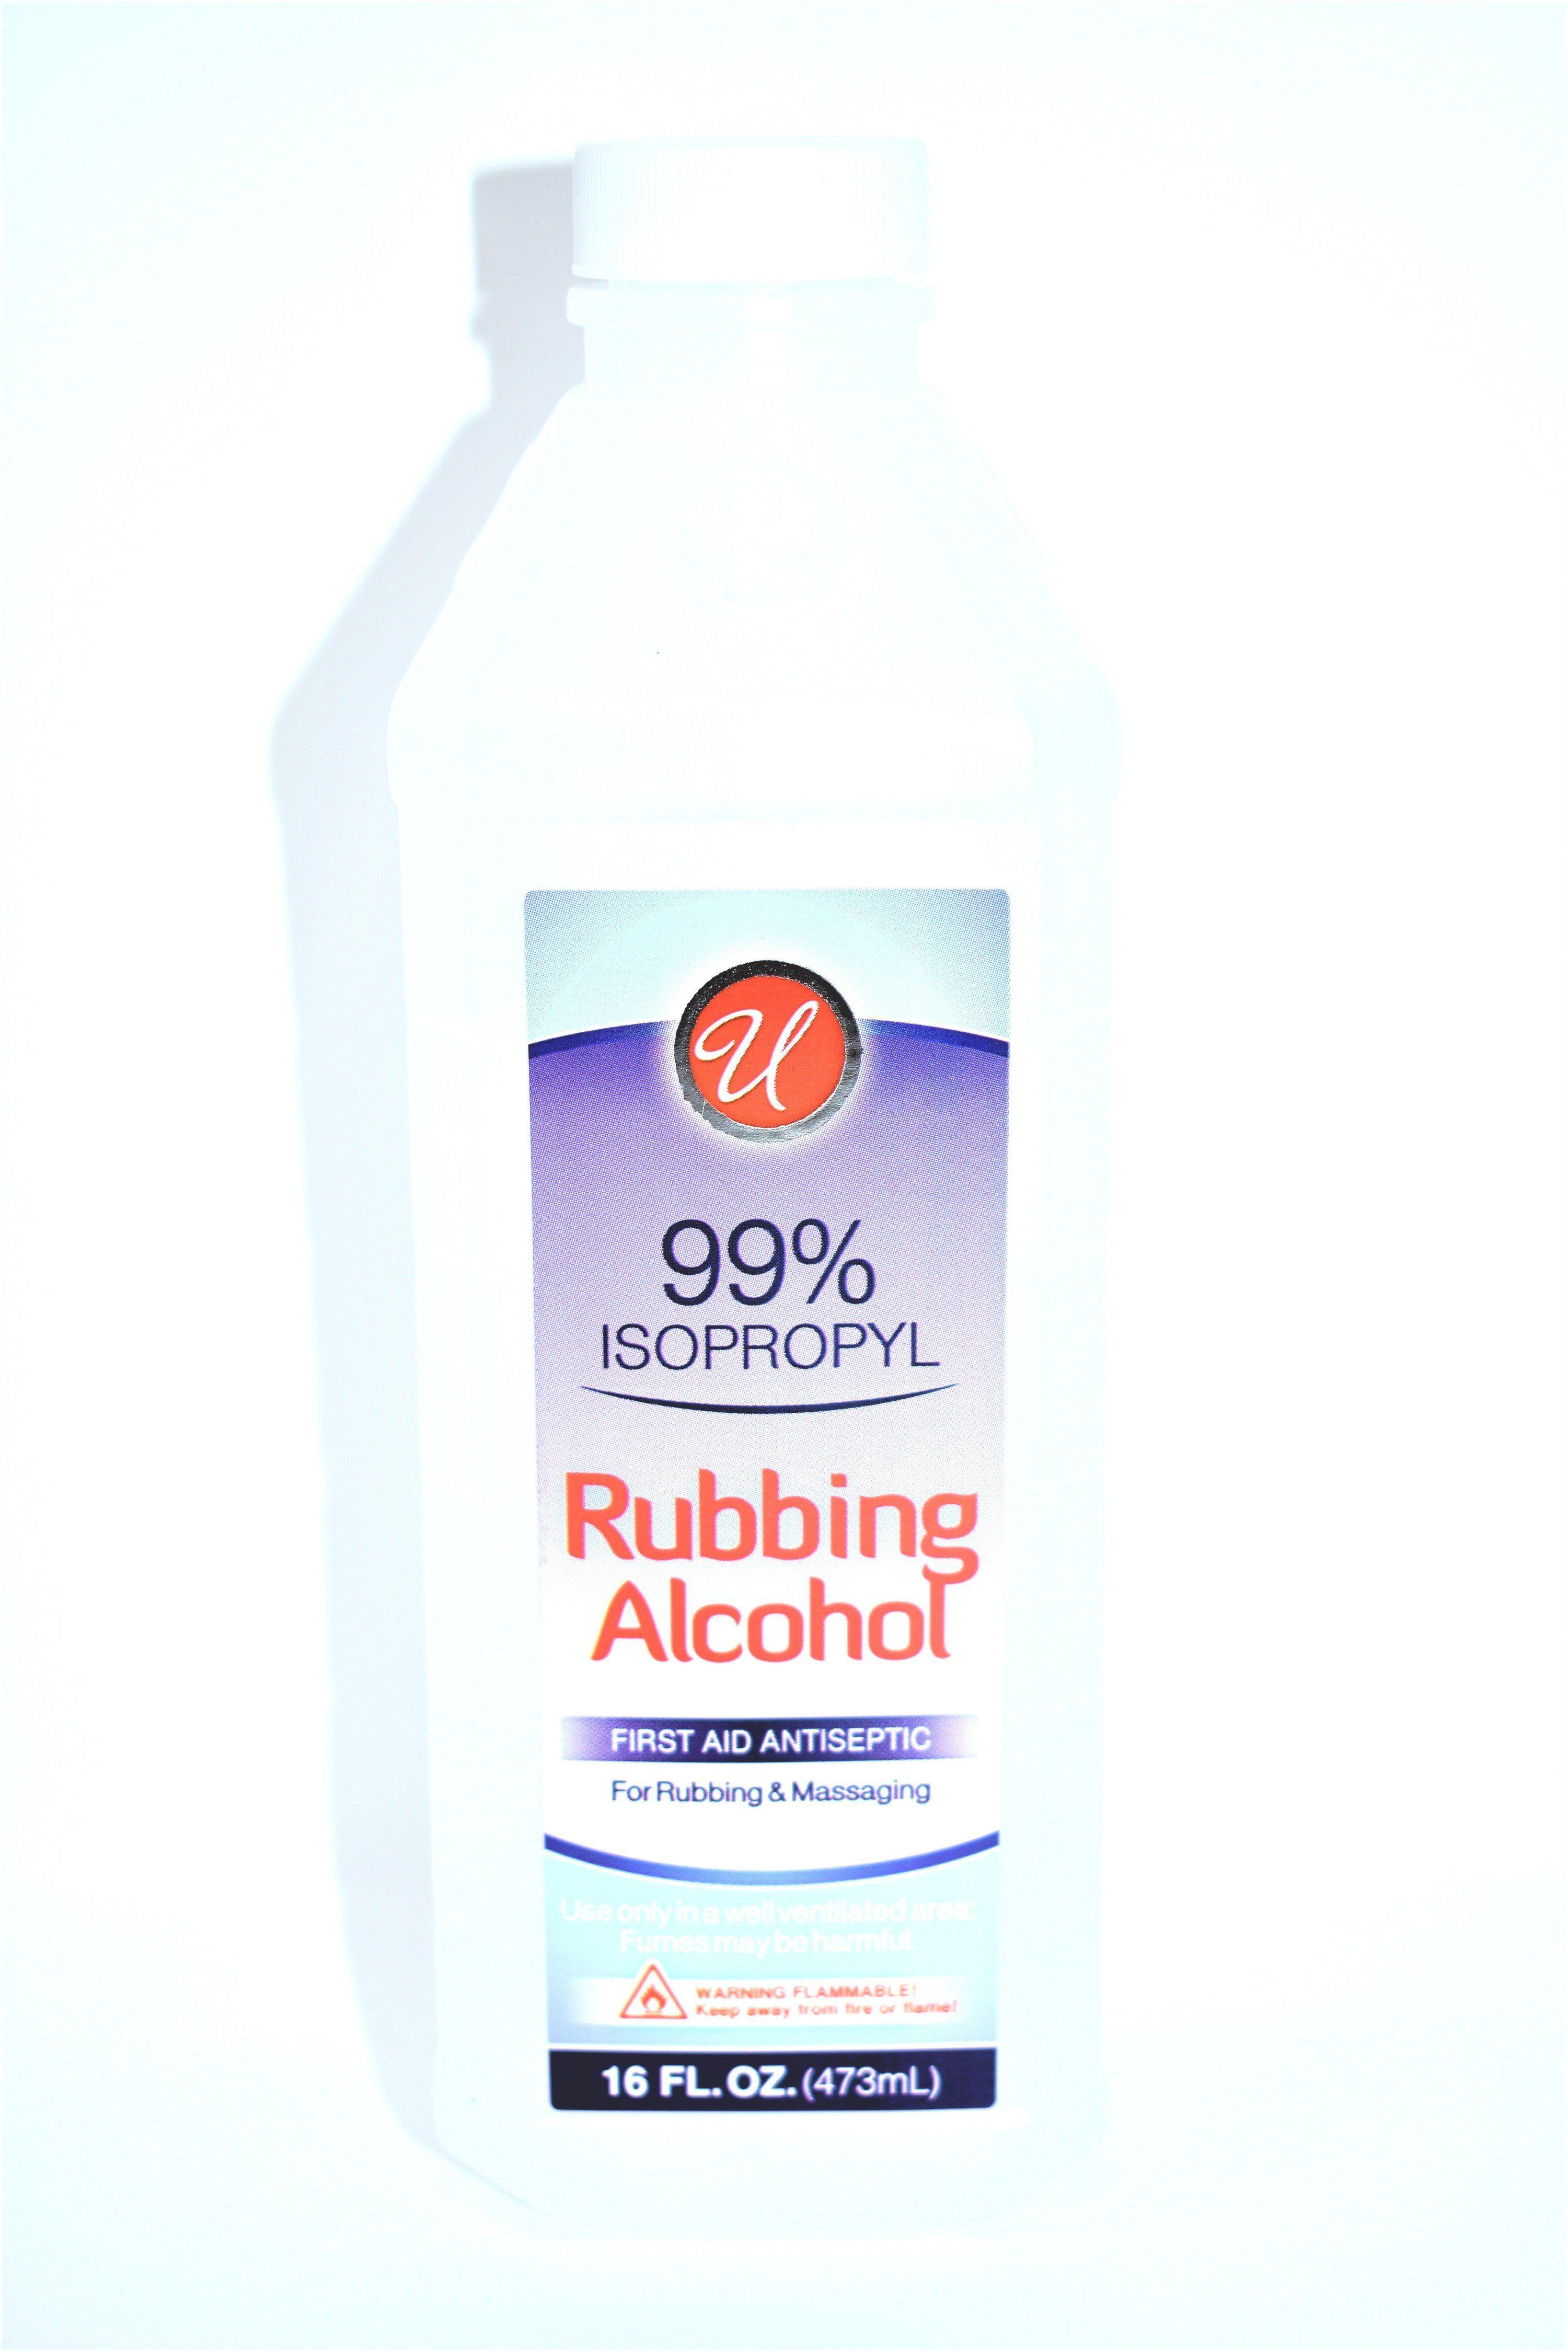 Universal 99% Isopropyl Rubbing Alcohol, 16 fl oz in 2019